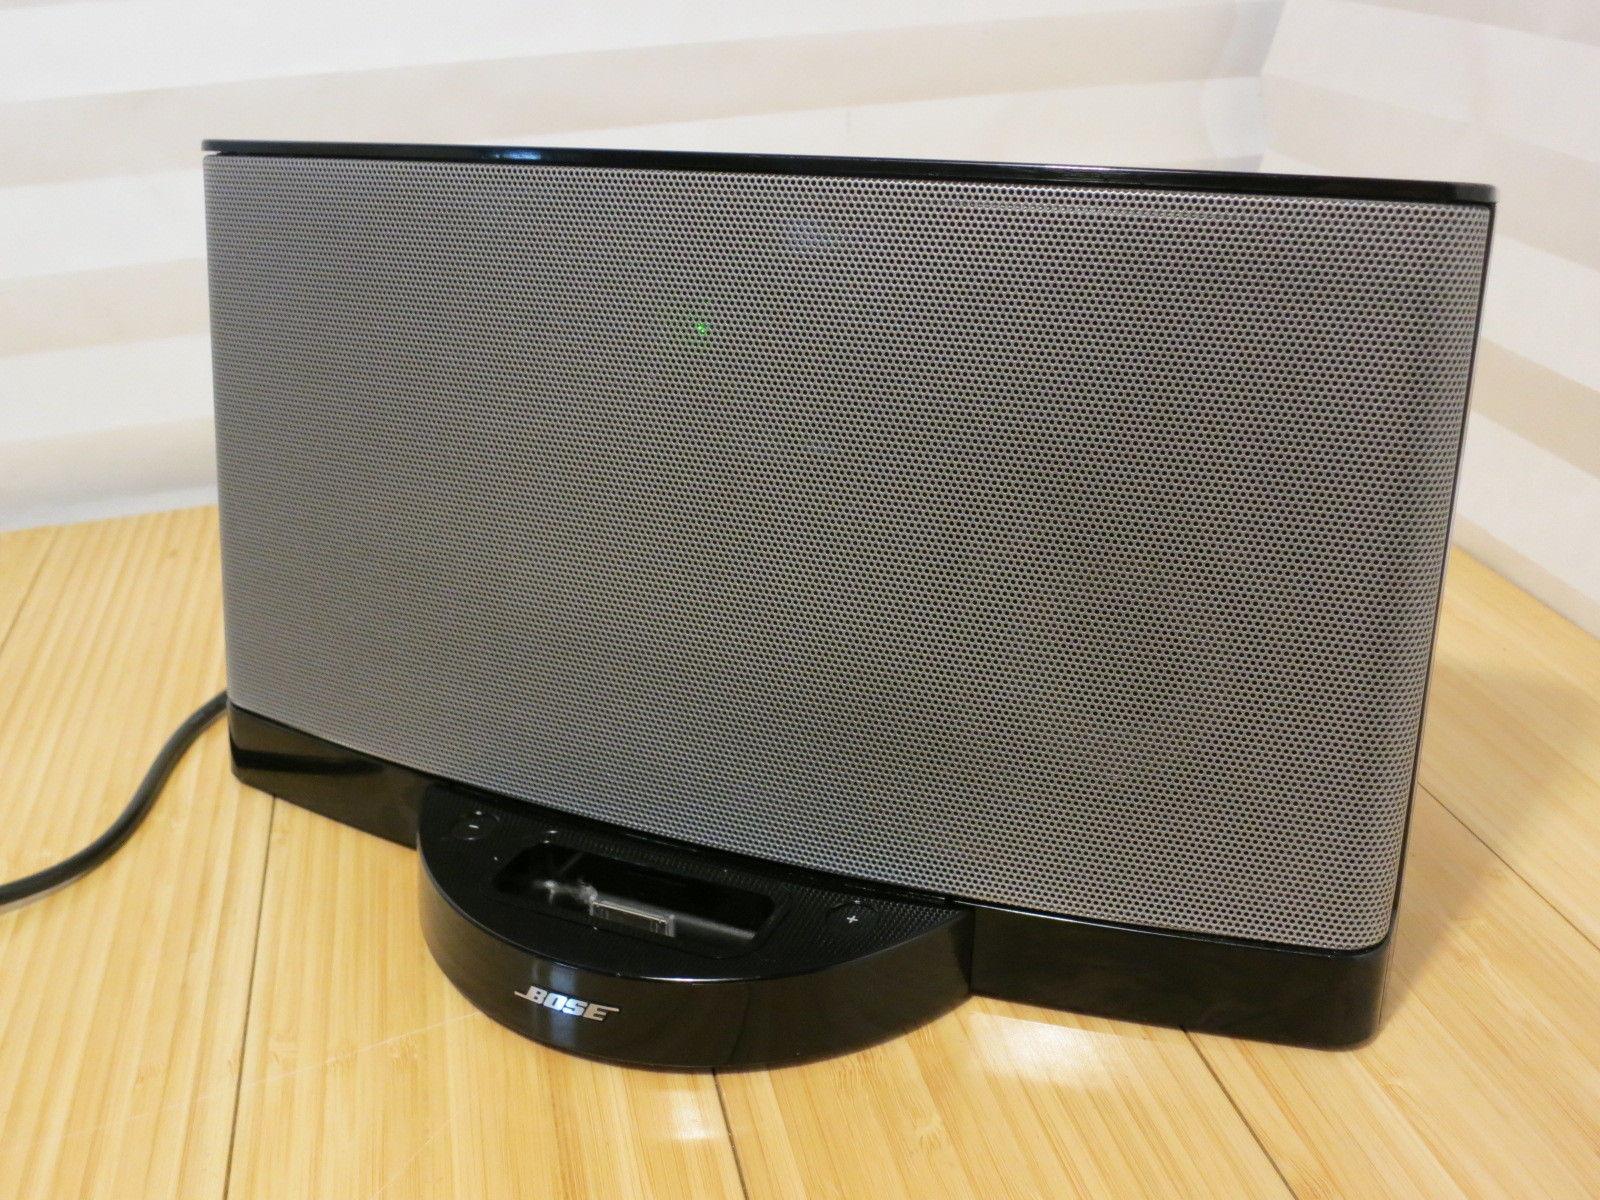 Bose SoundDock II Digital Music System Dock and 50 similar items